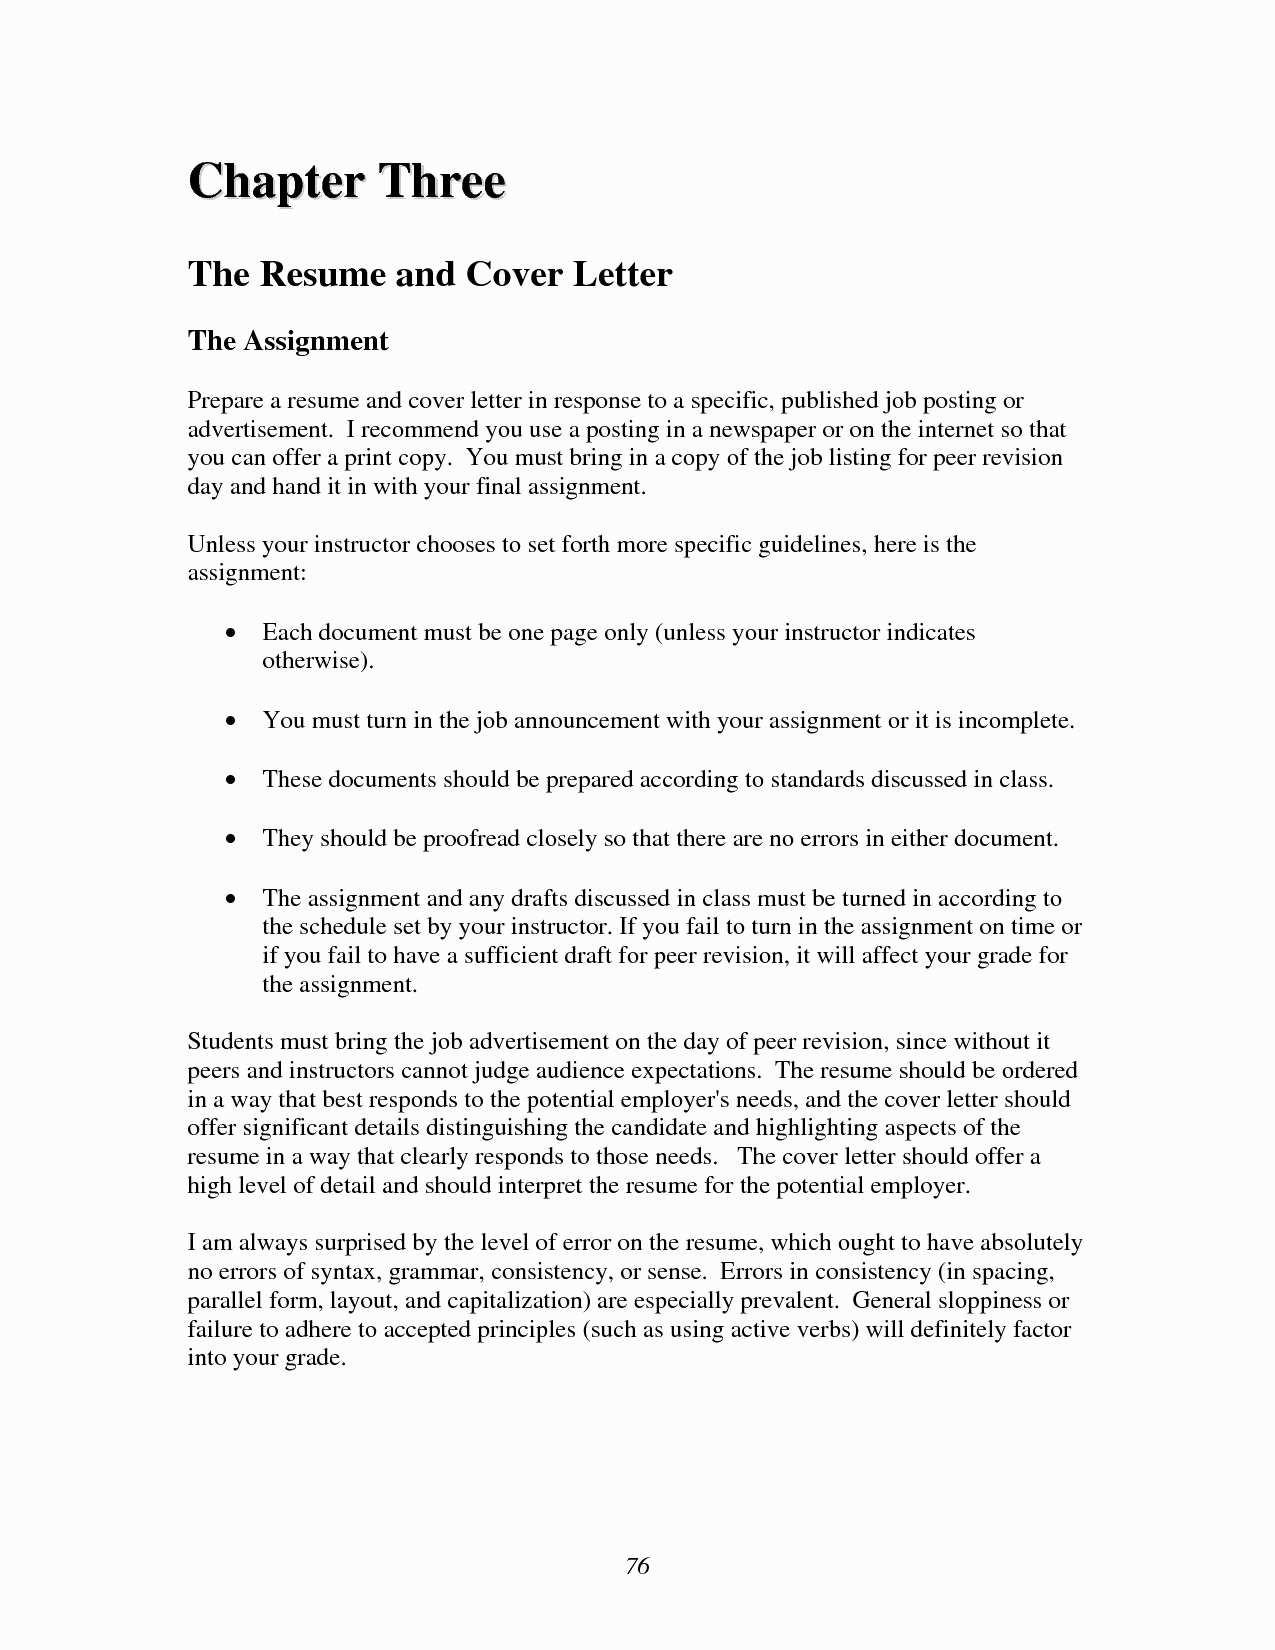 Fake Job Offer Letter Template - Job Fer Letter Template Us Copy Od Consultant Cover Letter Fungram